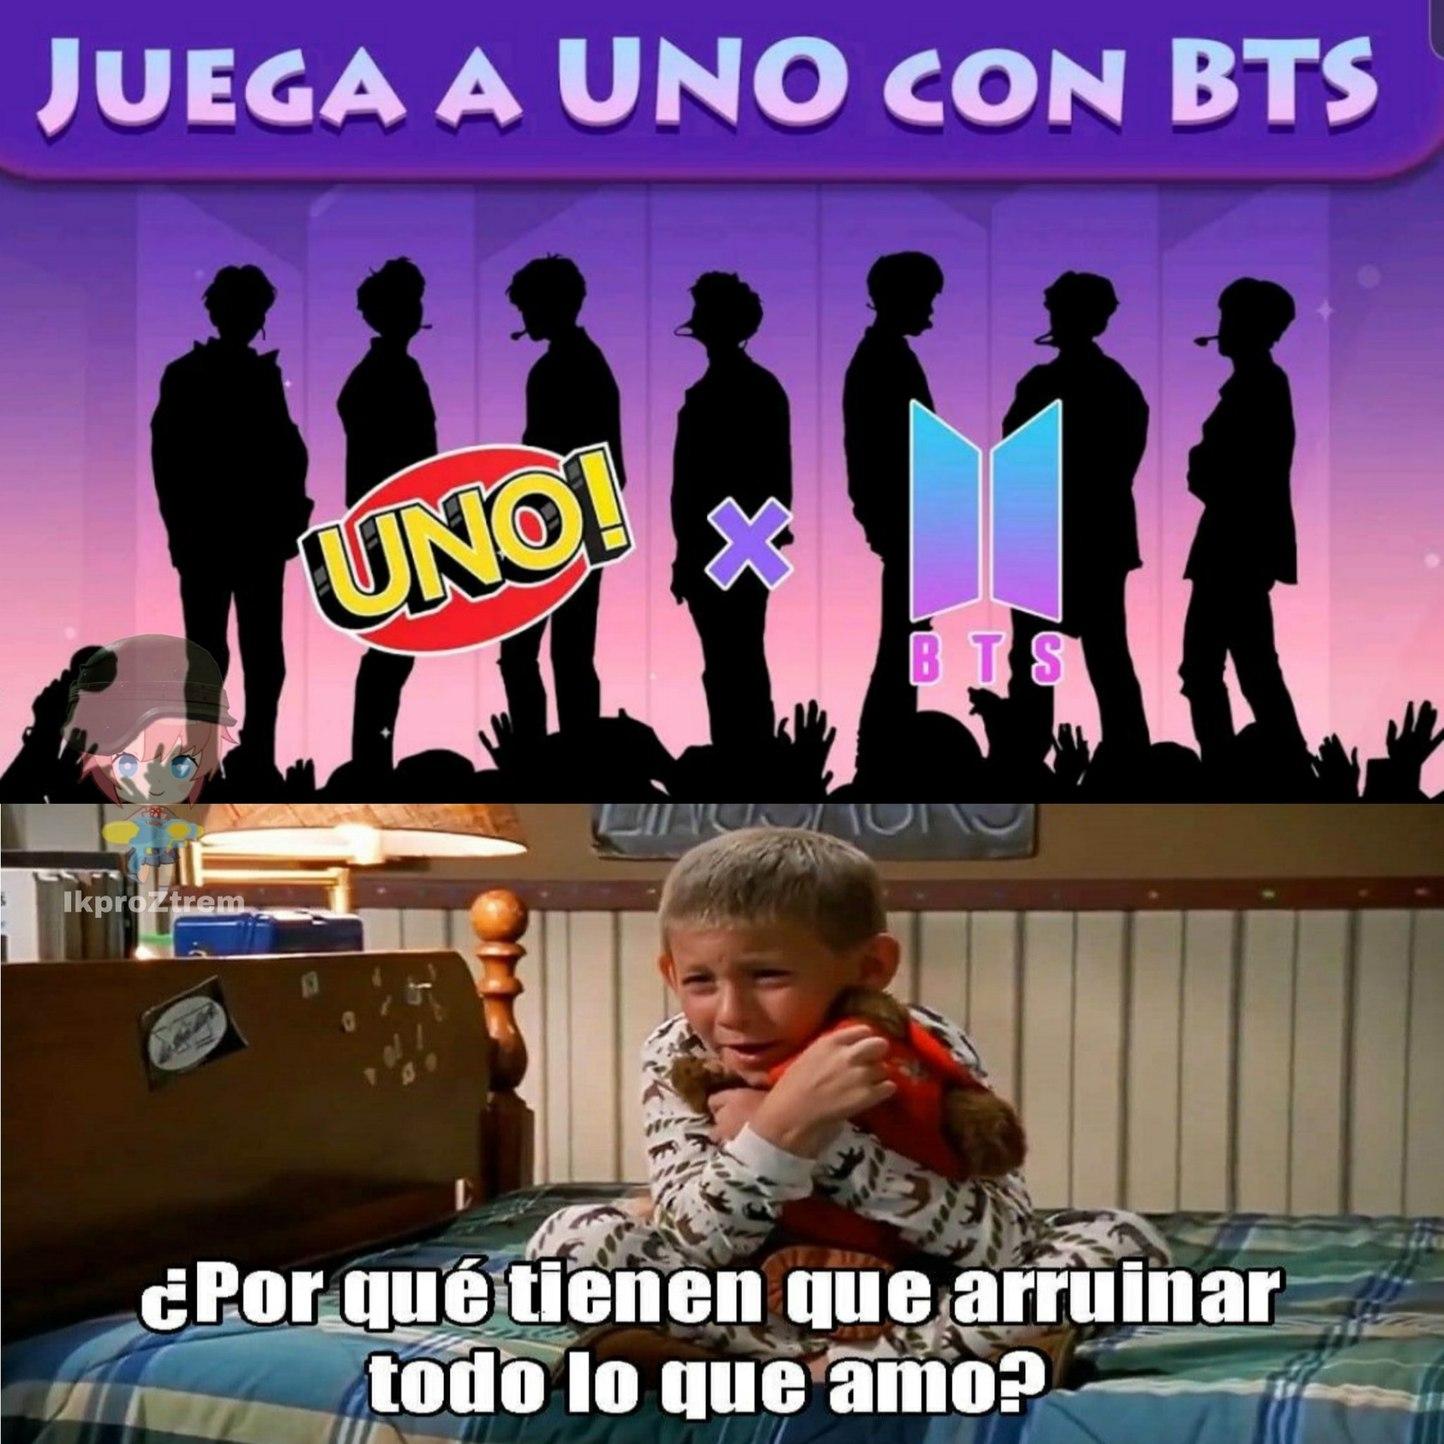 UNO x BTS - meme